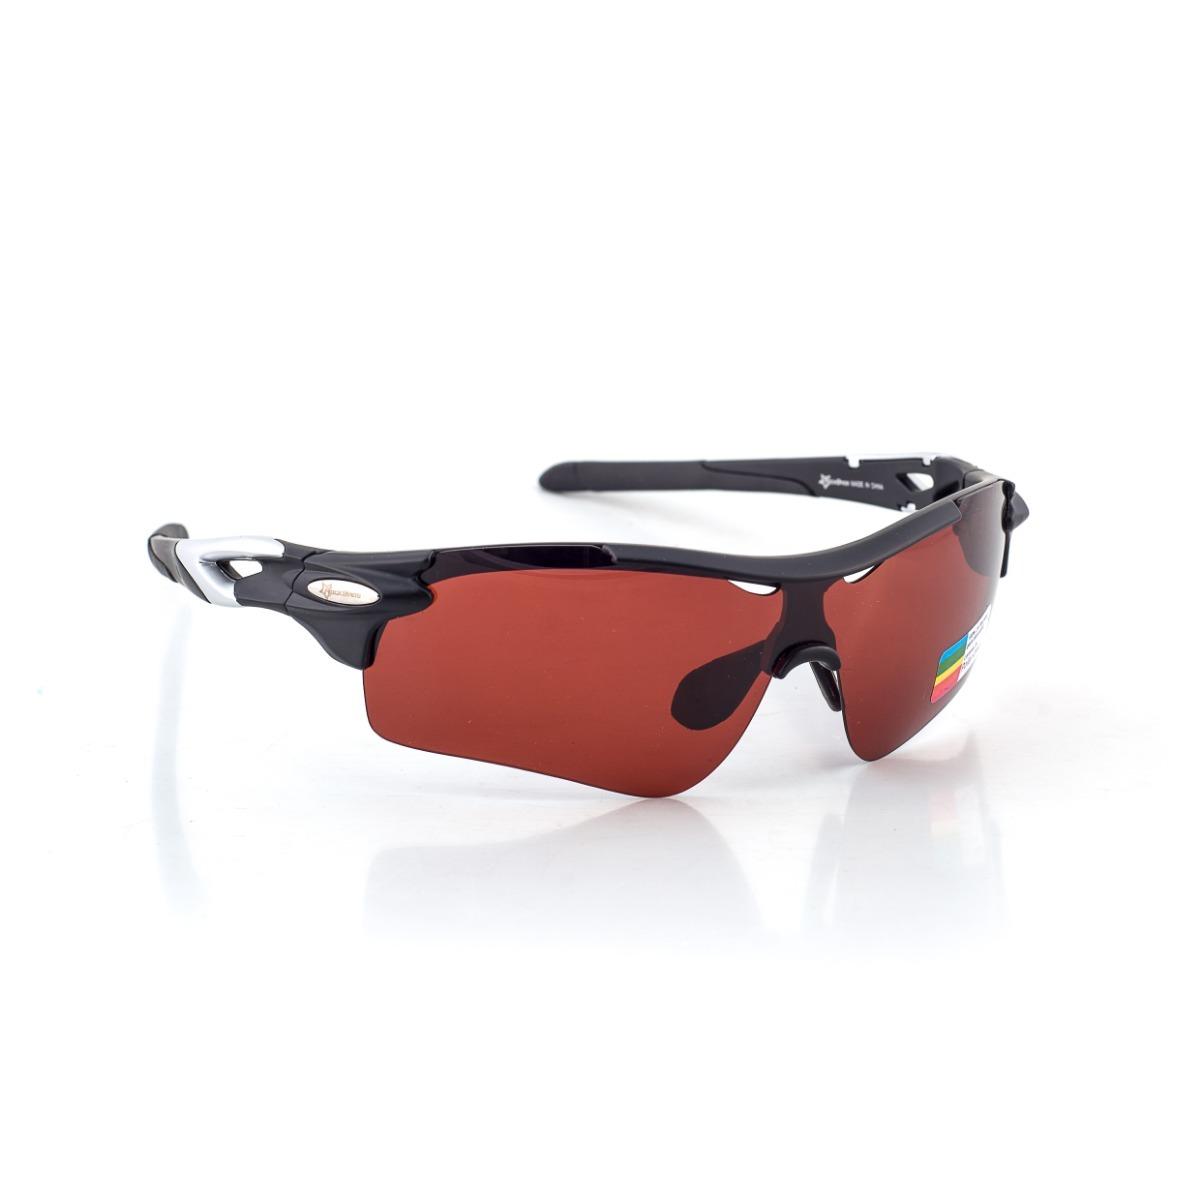 gafas rockbros ciclismo pesca deporte lente fotocromático. Cargando zoom. 636d99524b95